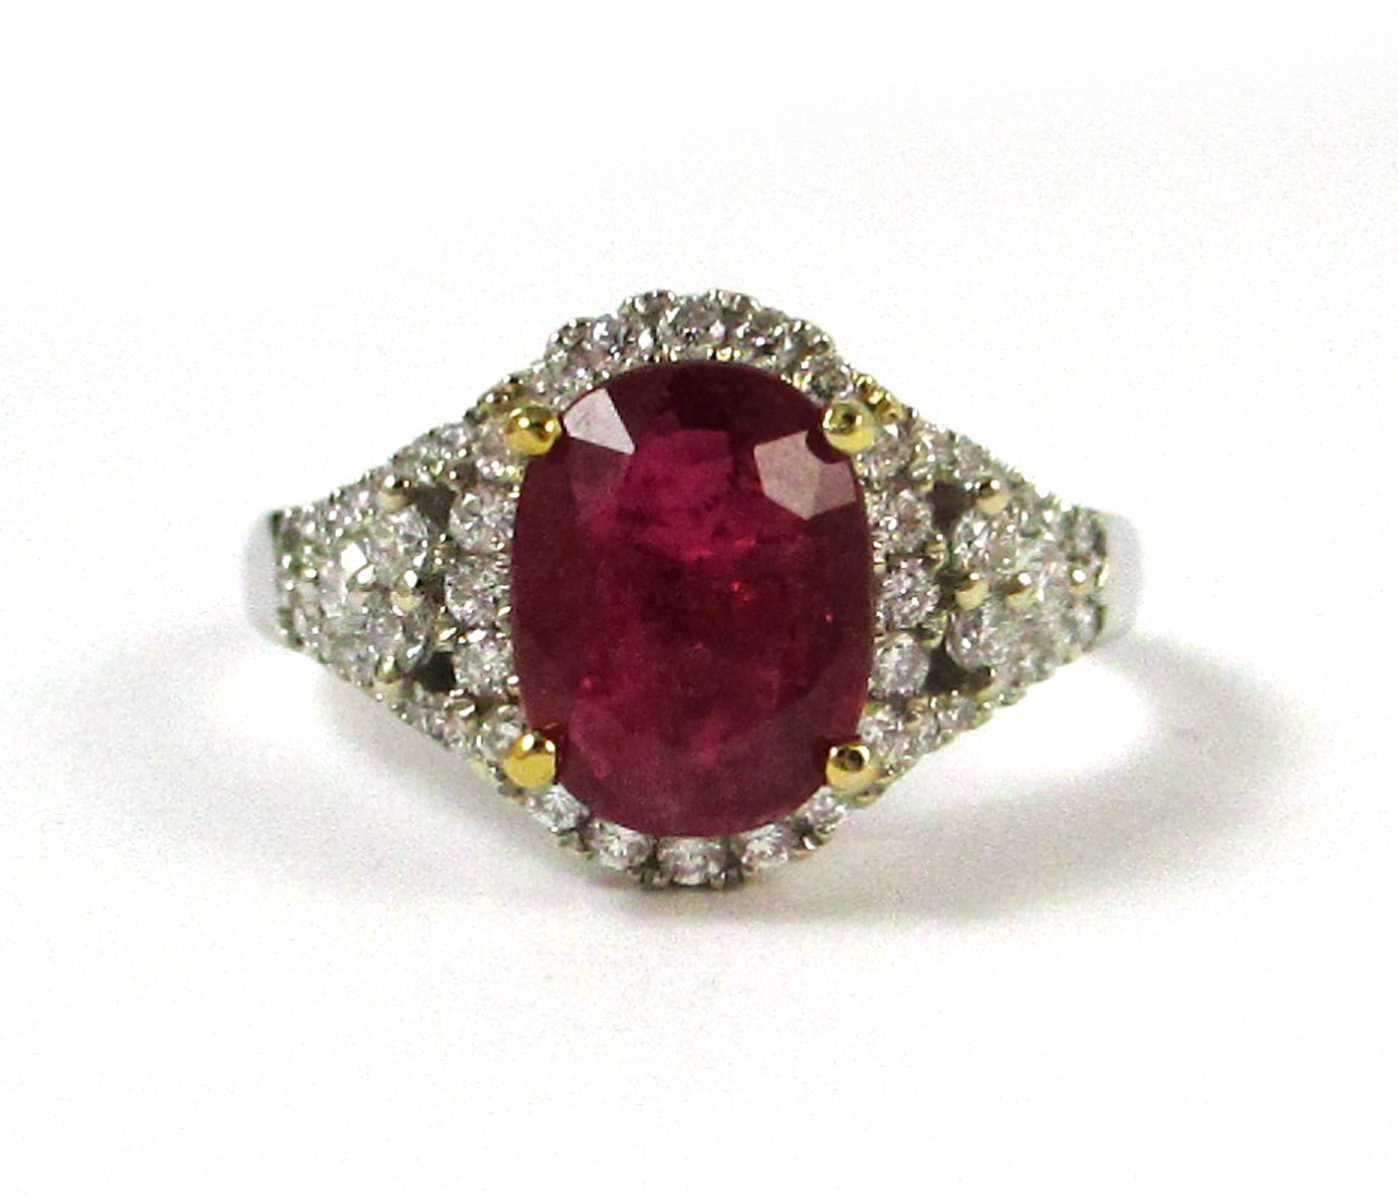 RUBY, DIAMOND AND FOURTEEN KARAT GOLD RING. The 1